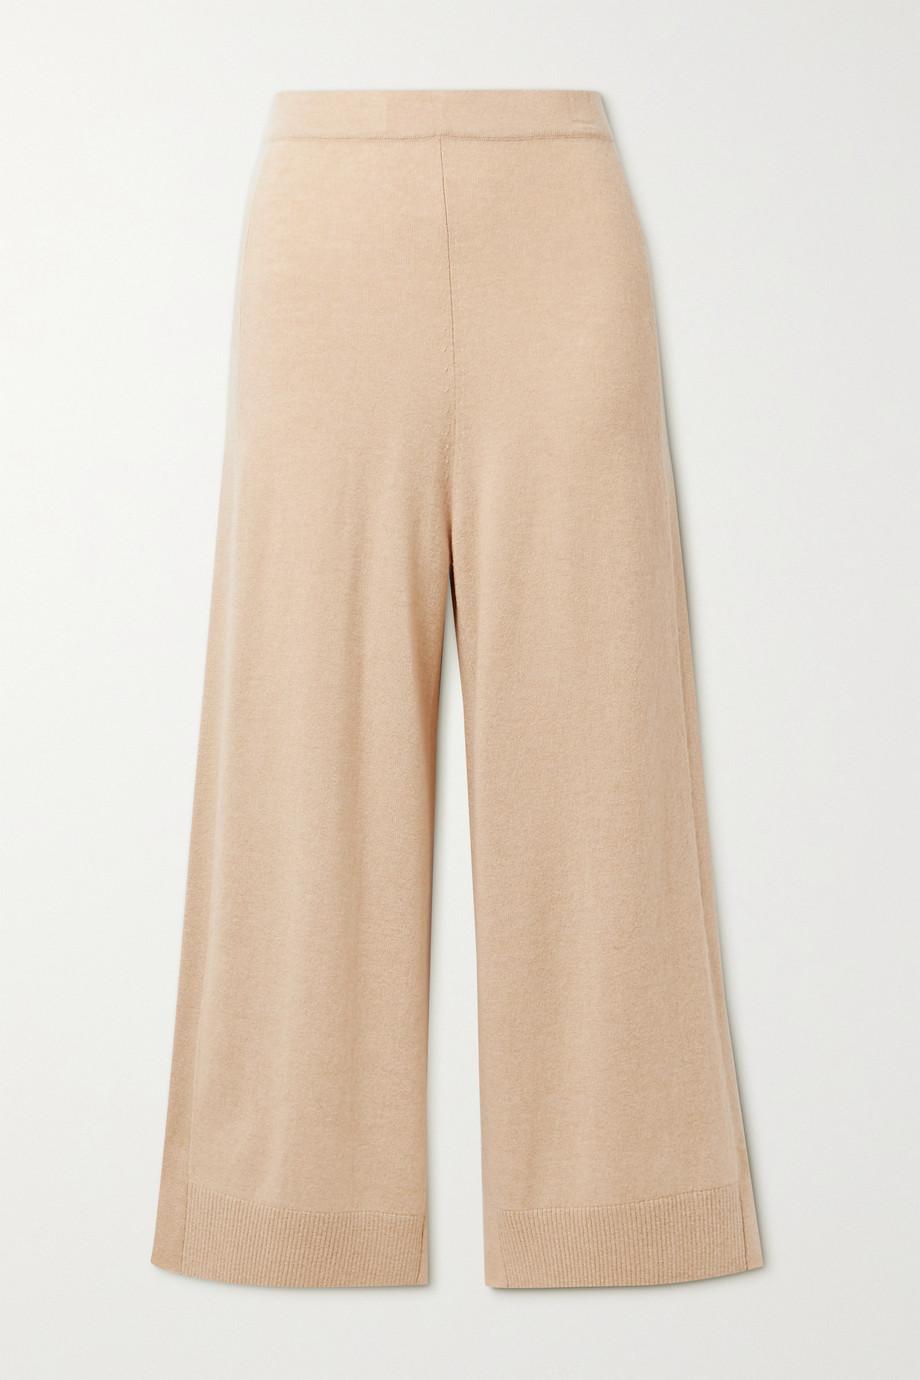 Rosetta Getty Cropped cashmere wide-leg pants